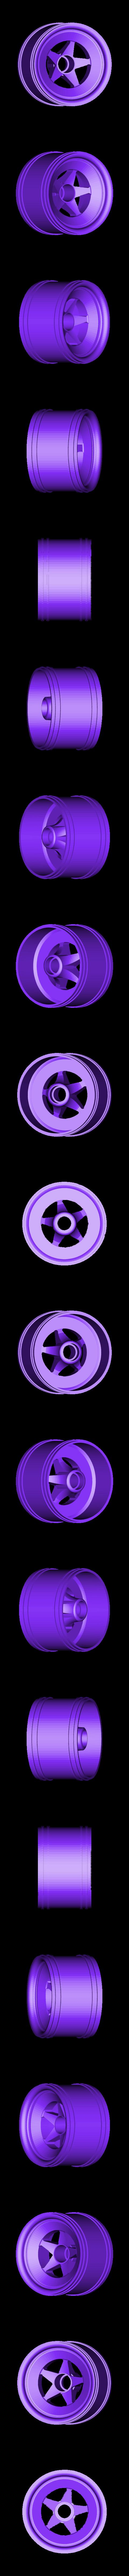 front rim.stl Download free STL file Aryton Senna's Mclaren MP4/6 3d Printed RC F1 Car • 3D printing design, brett